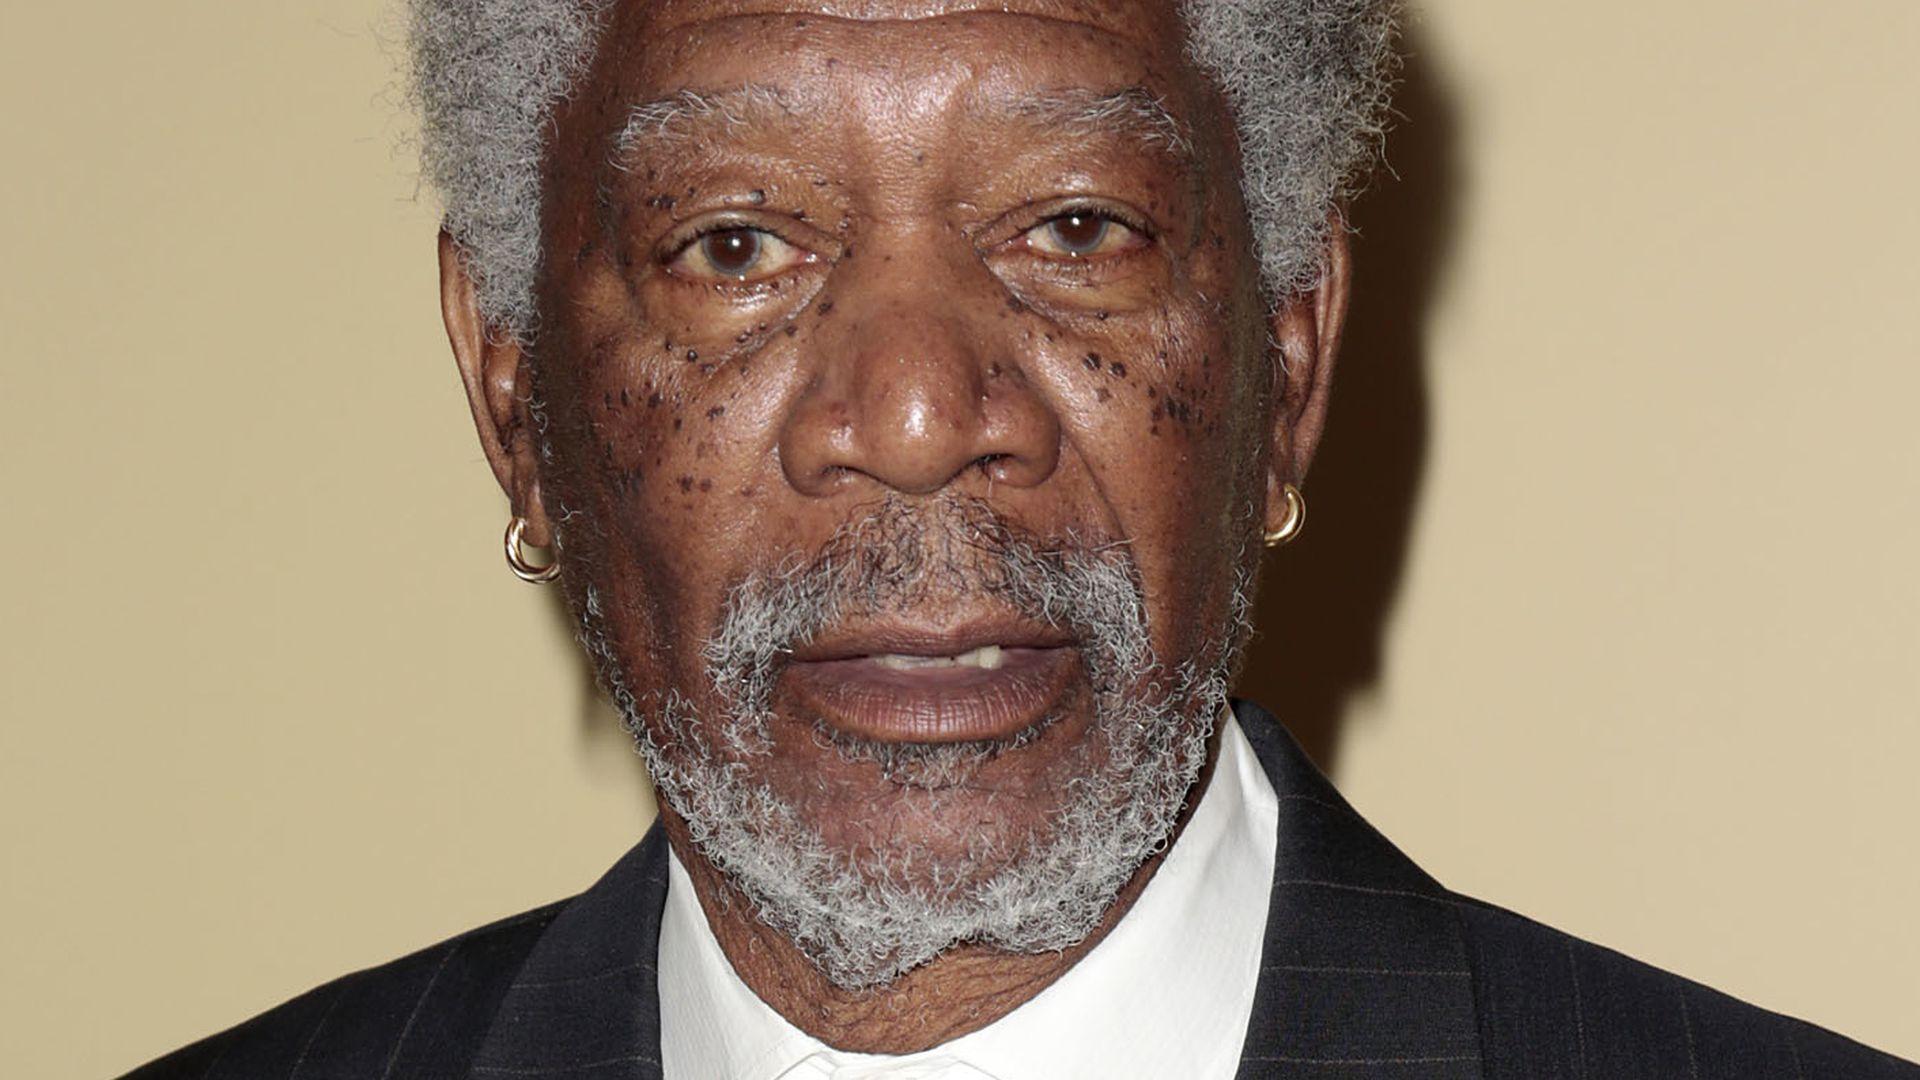 Sex-Vorw-rfe-Morgan-Freeman-entschuldigt-sein-Verhalten